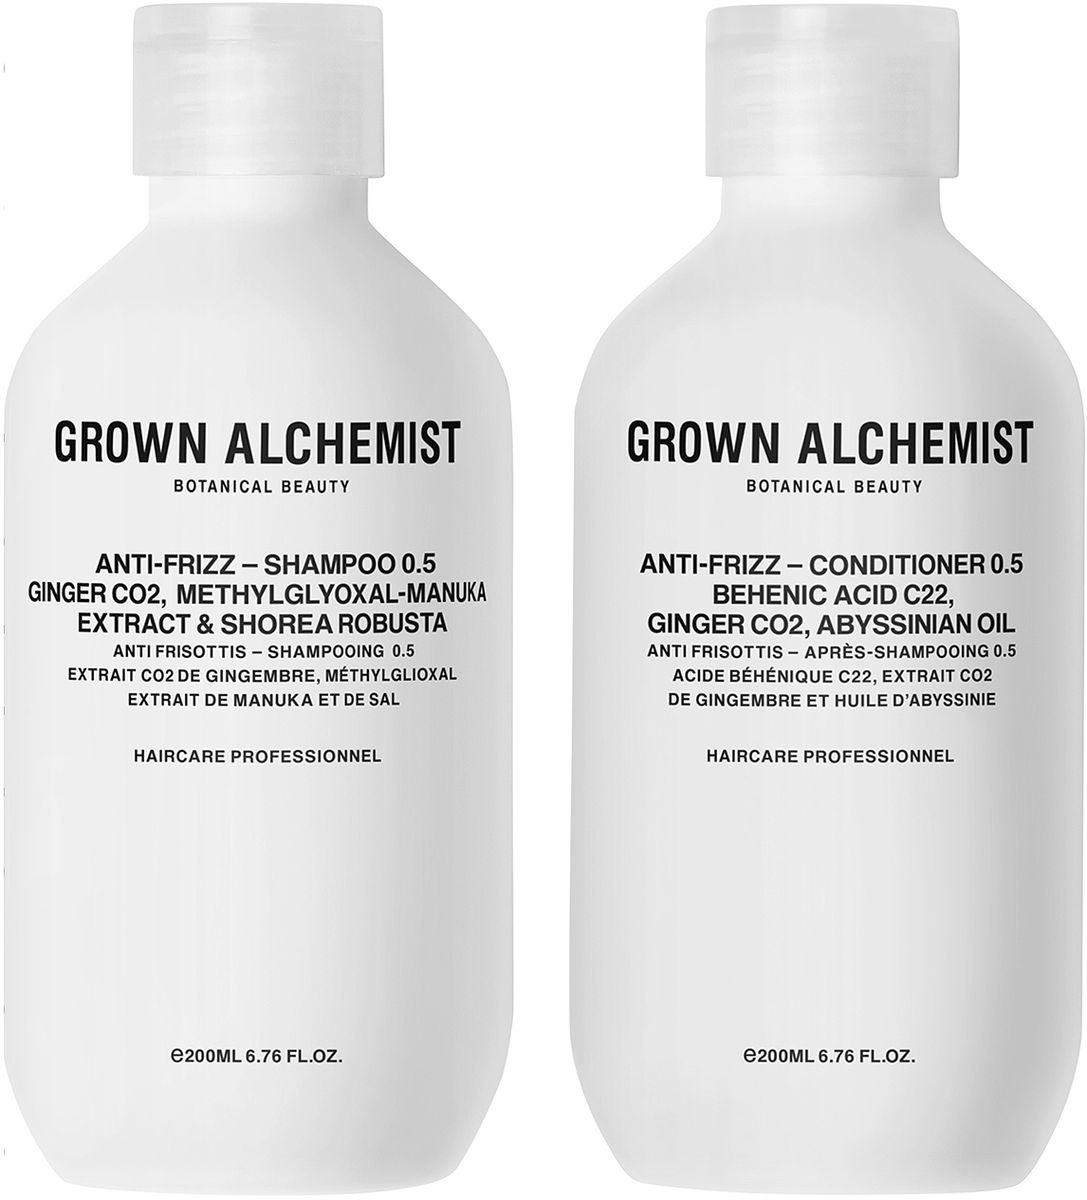 Grown Alchemist Набор для волос Разглаживающий: кондиционер, шампунь, 2 х 200 мл182451Набор для волос разглаживающий: разглаживающий шампунь 200 мл, разглаживающий кондиционер 200 мл